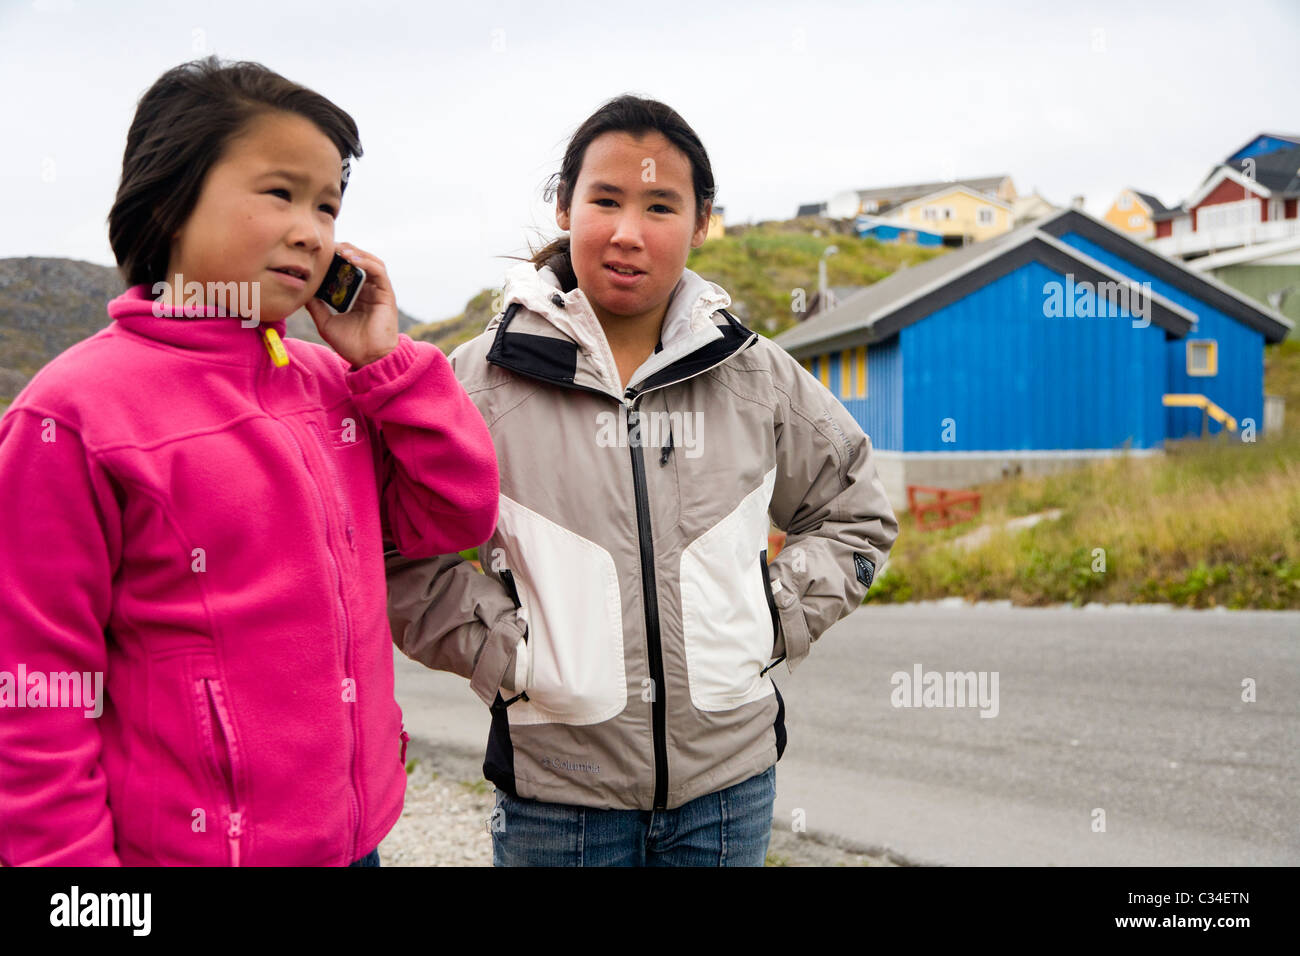 Girl talking on a mobile phone. Qaqortoq (Julianehåb), South Greenland - Stock Image